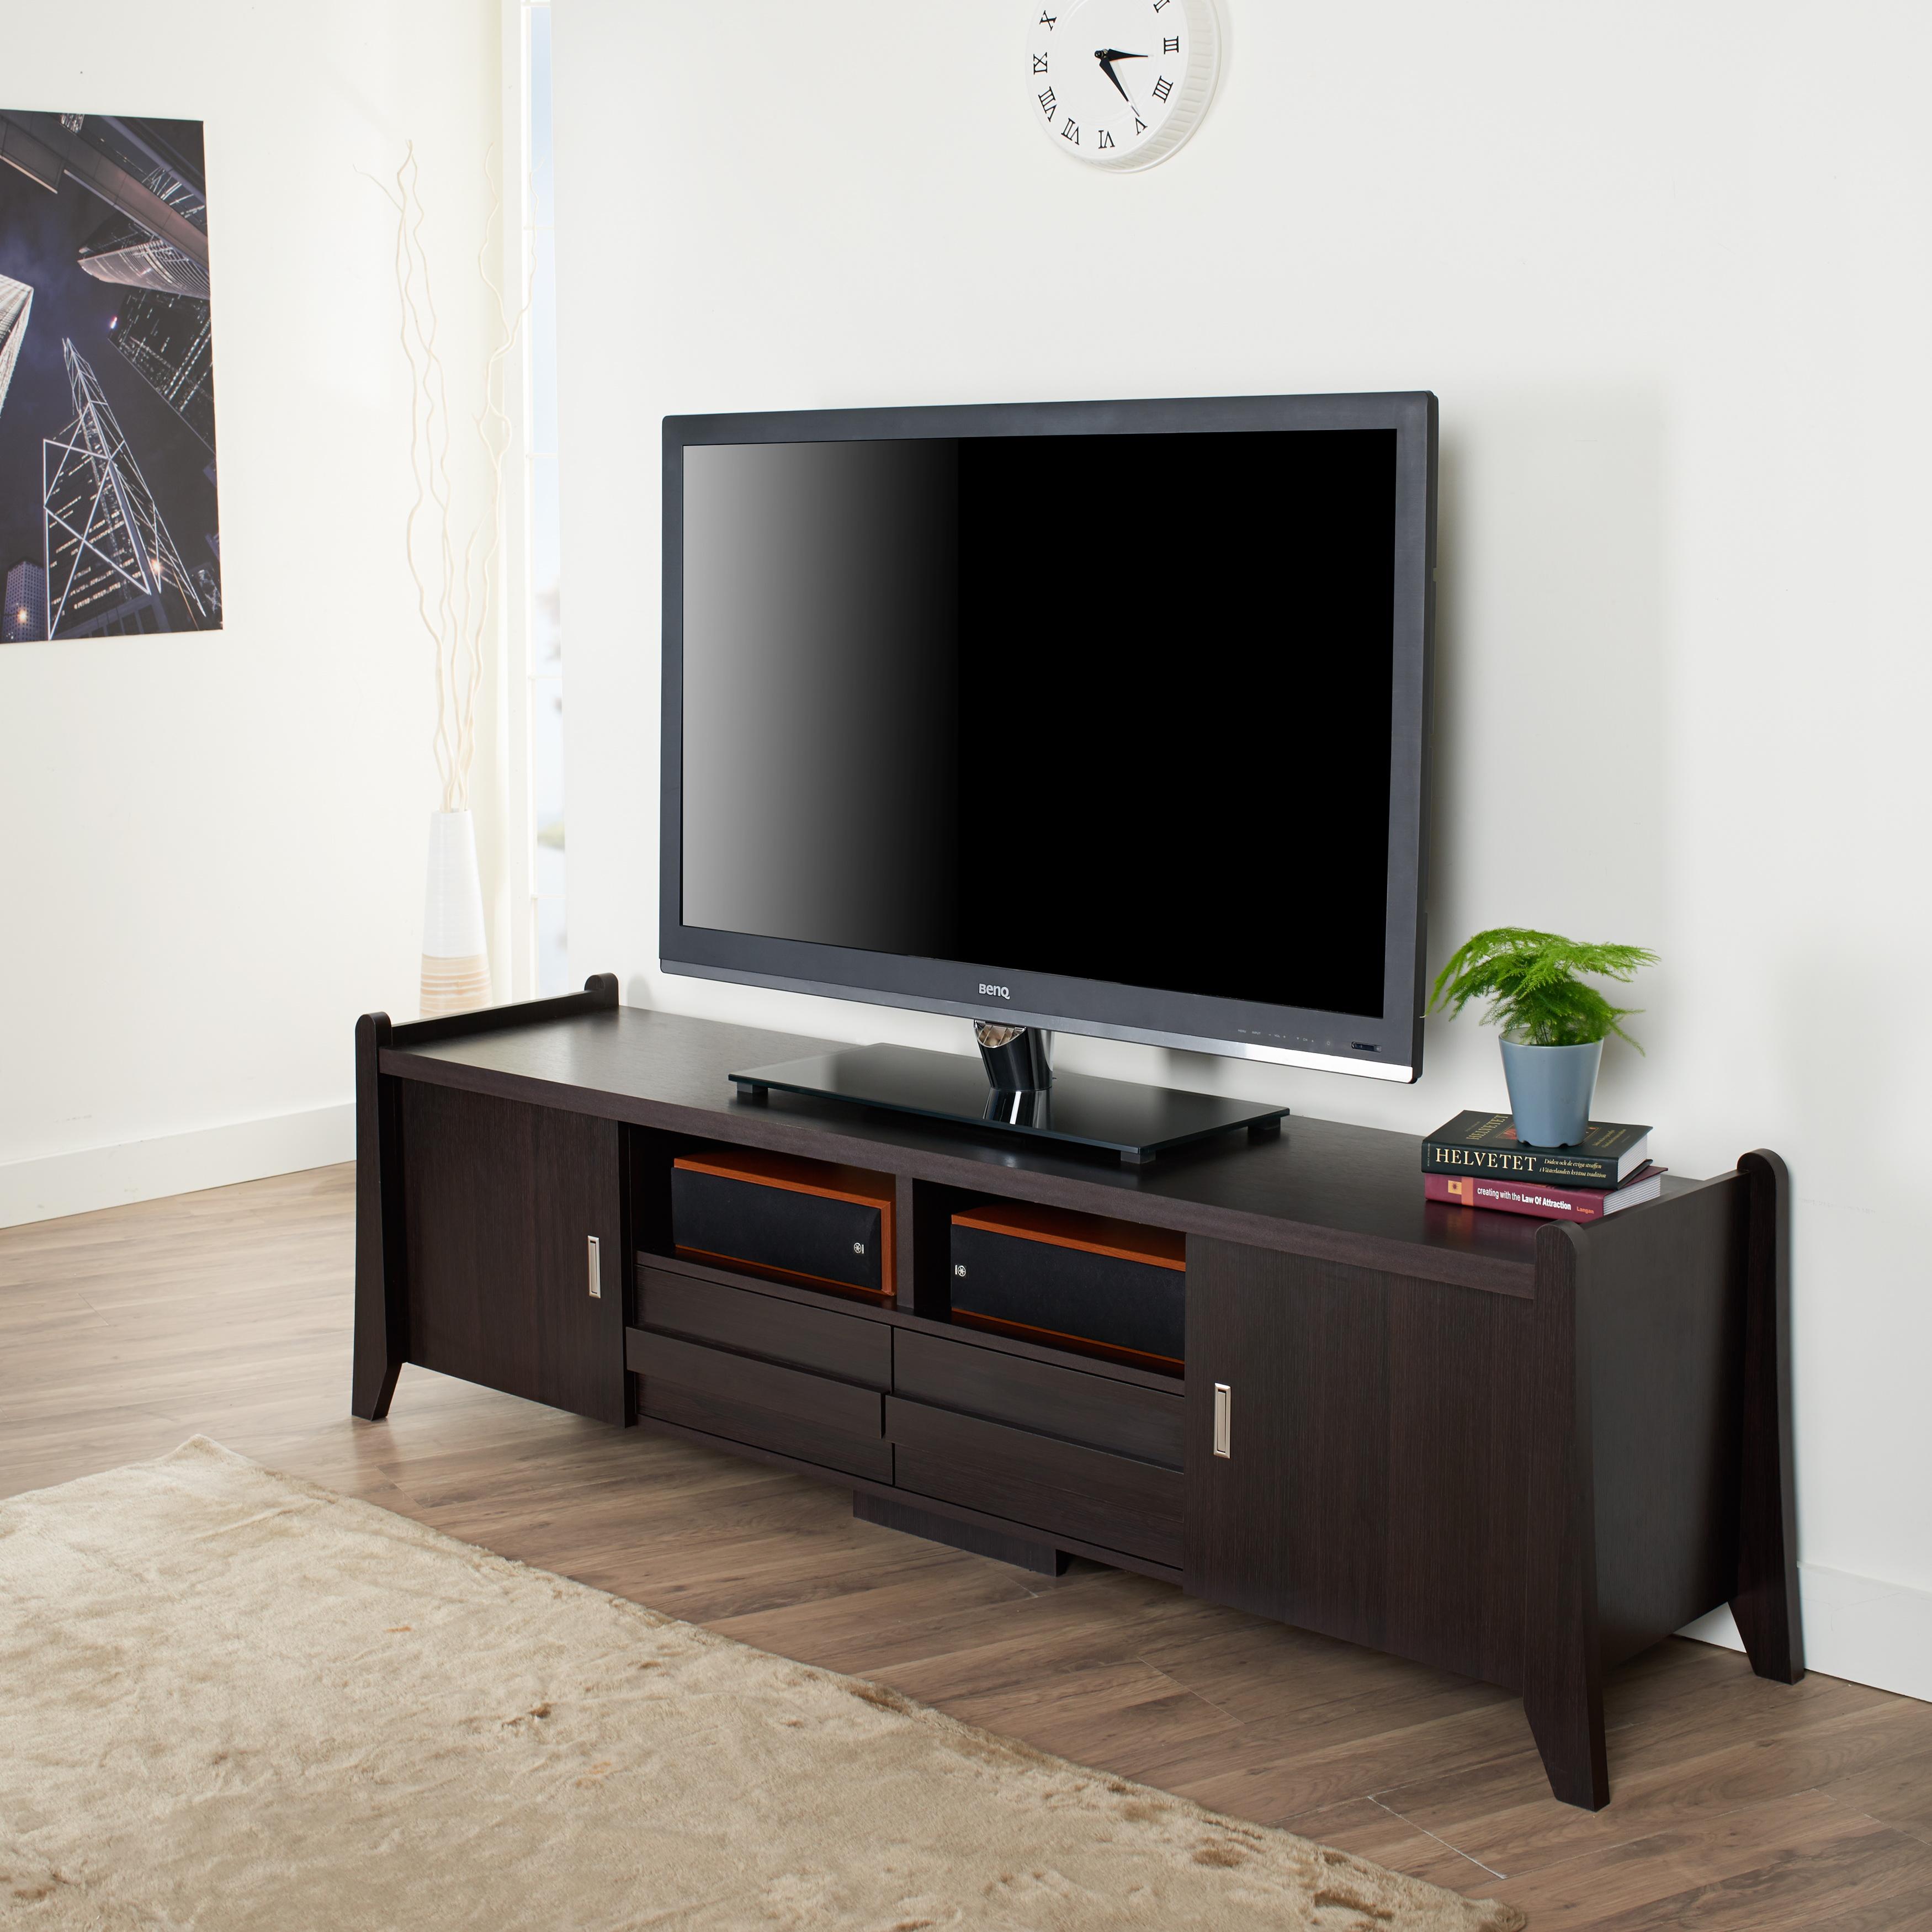 Furniture Of America Tanya Low Profile Entertainment Center